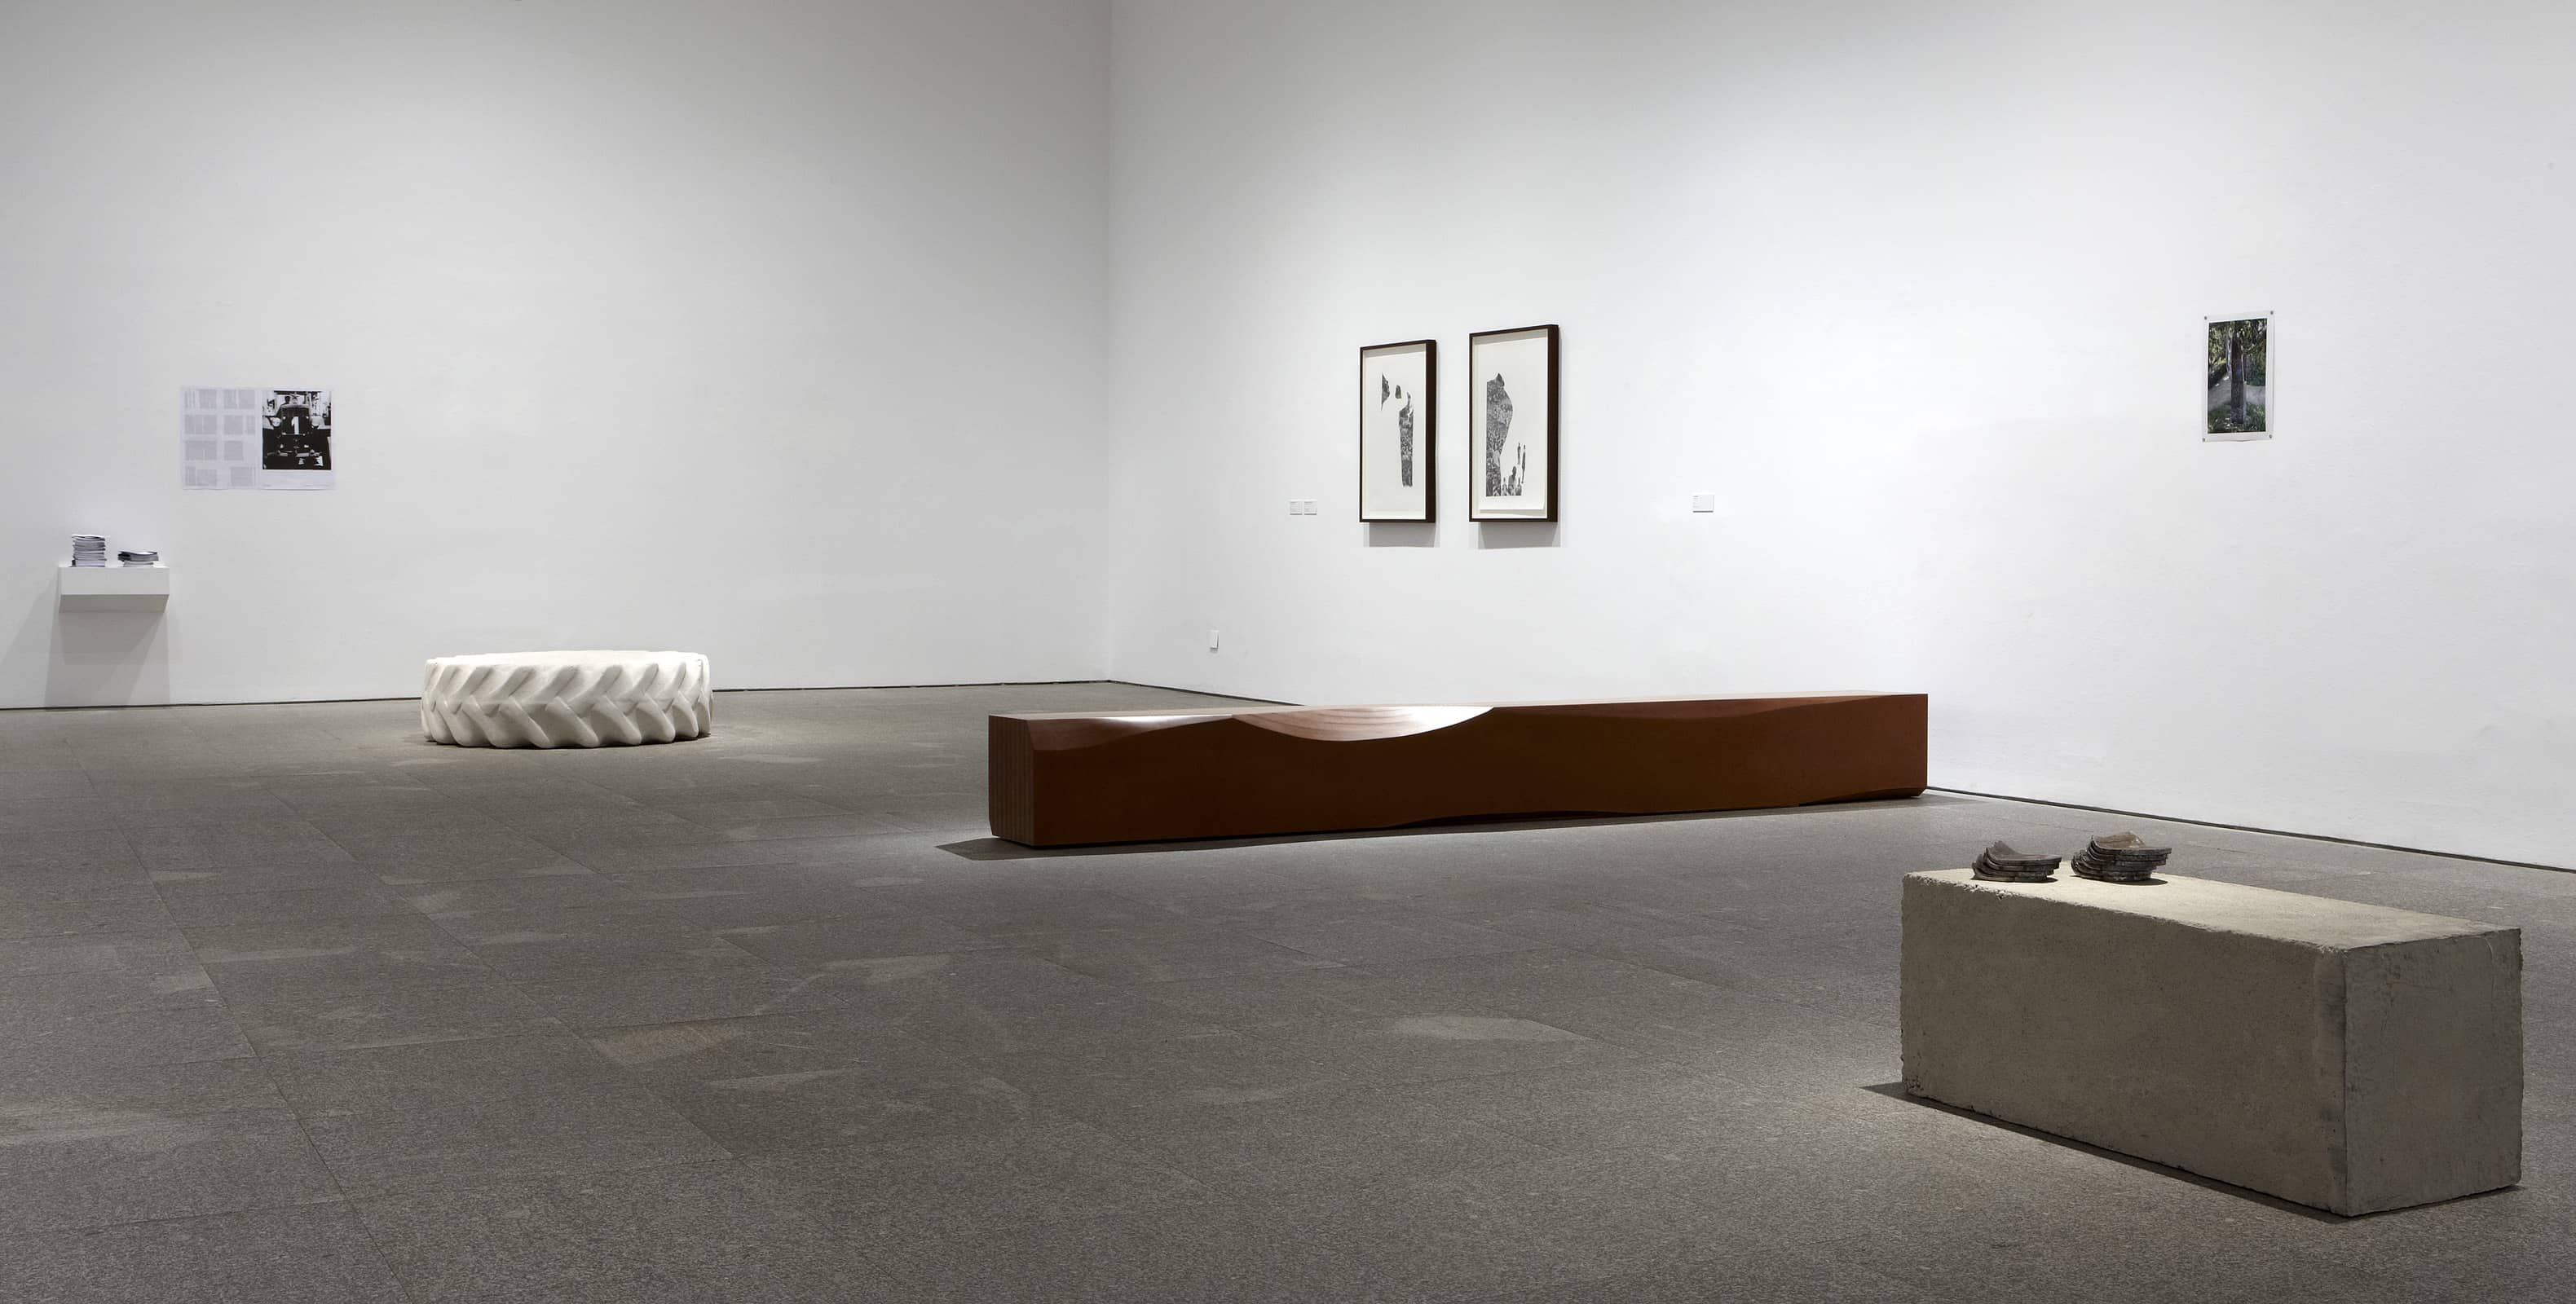 Installation view: Asier Mendizabal, MNCARS, Madrid, 2011 |  | ProjecteSD